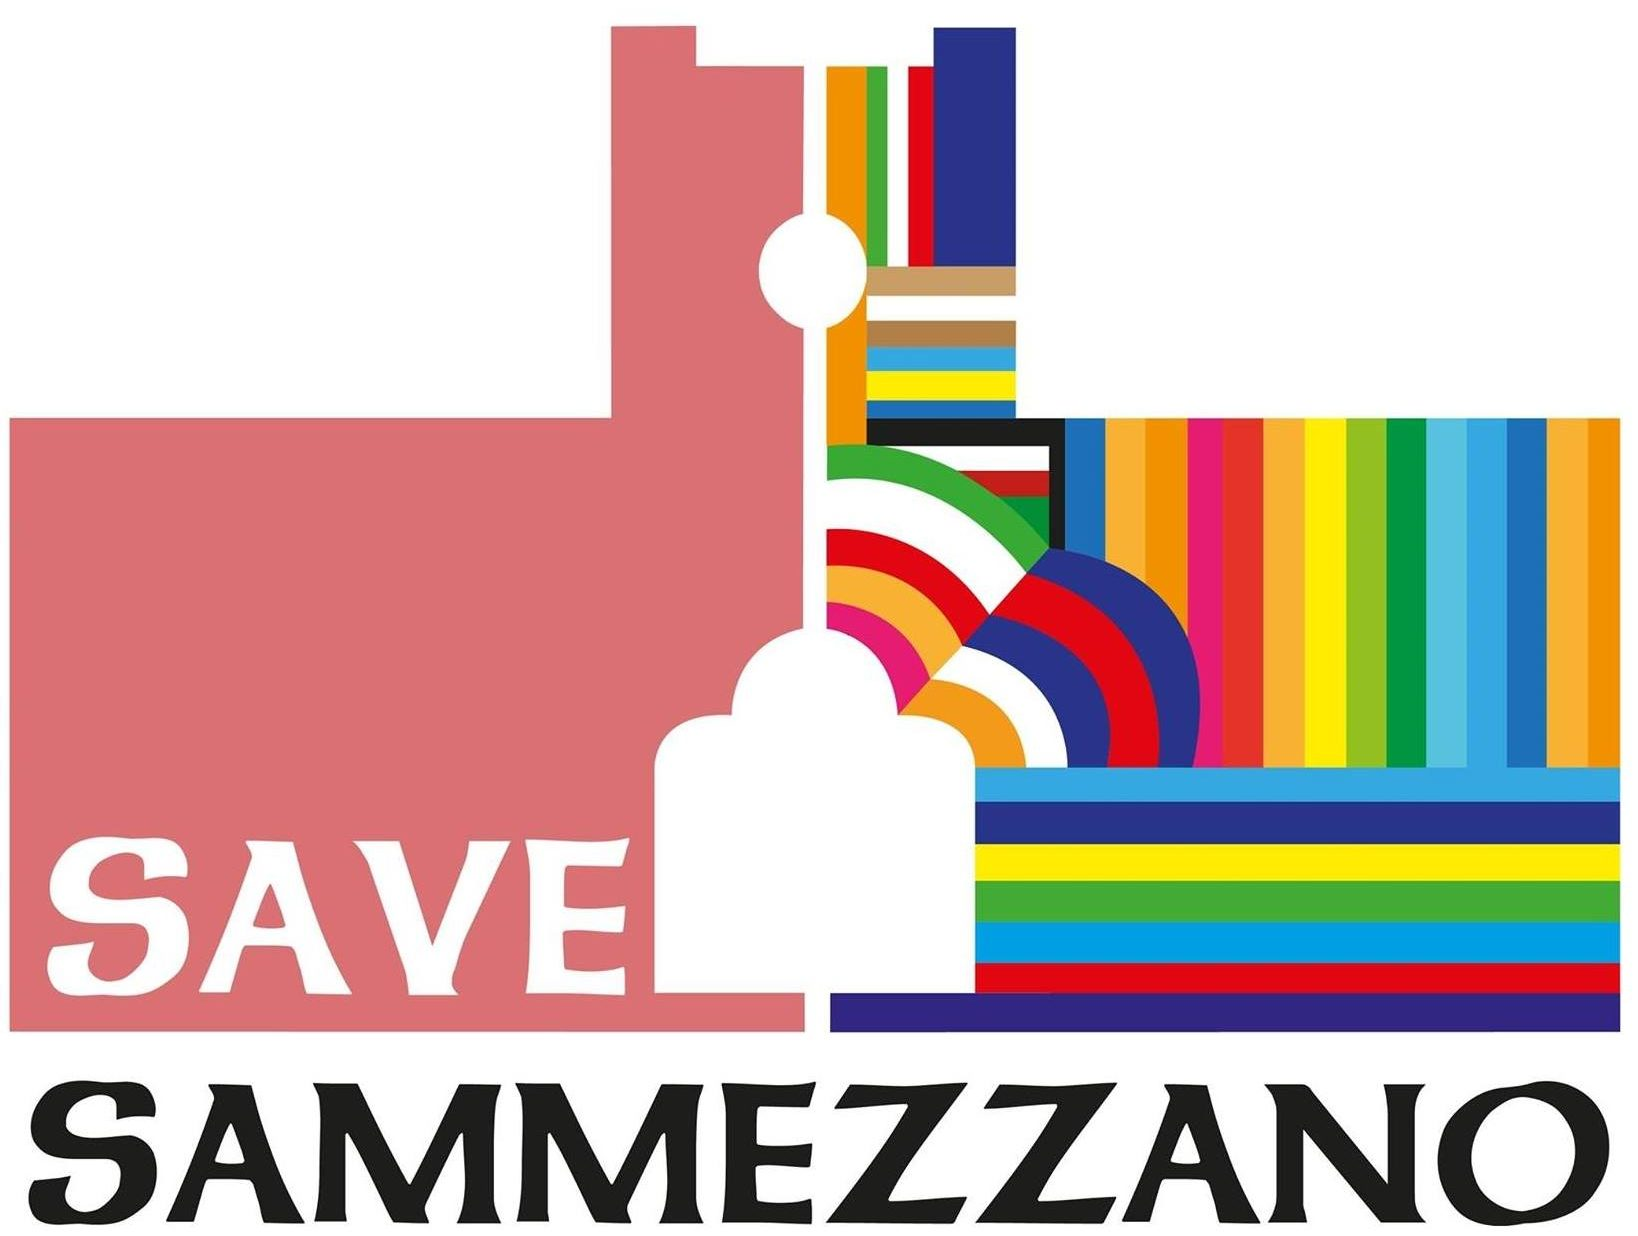 SaveSammezzano